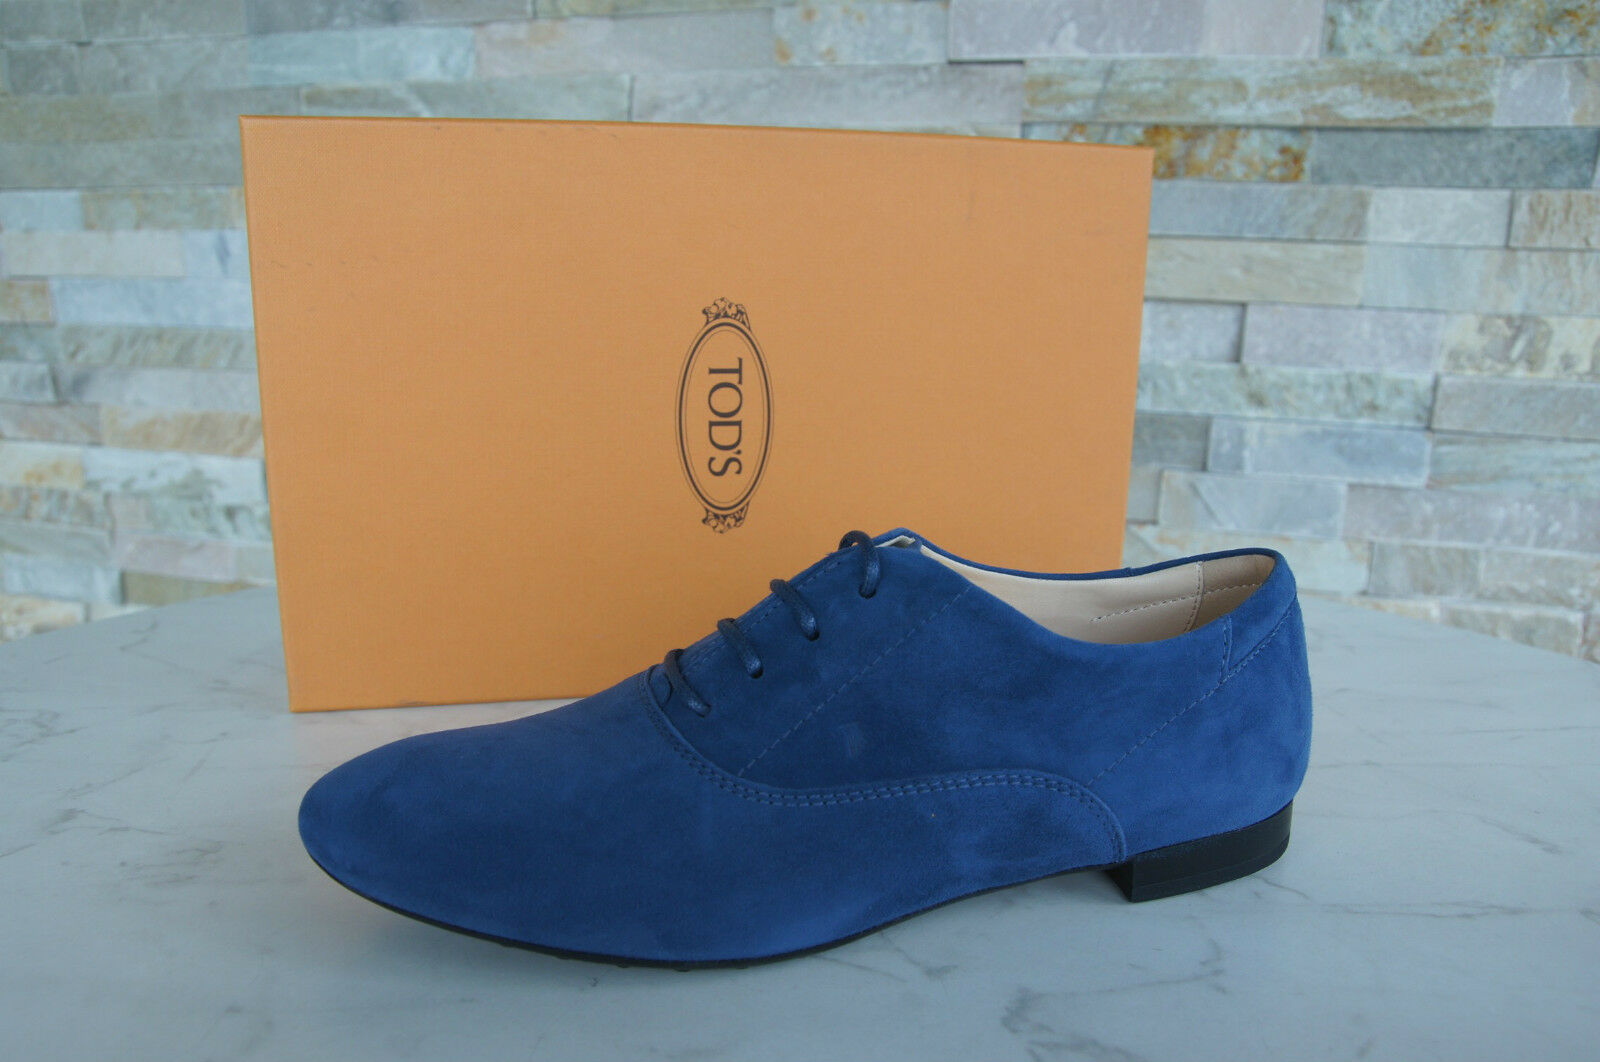 Tods Tod's talla talla talla 37,5 schnürzapatos zapato bajo zapatos azul azul nuevo ex. PVP  a la venta